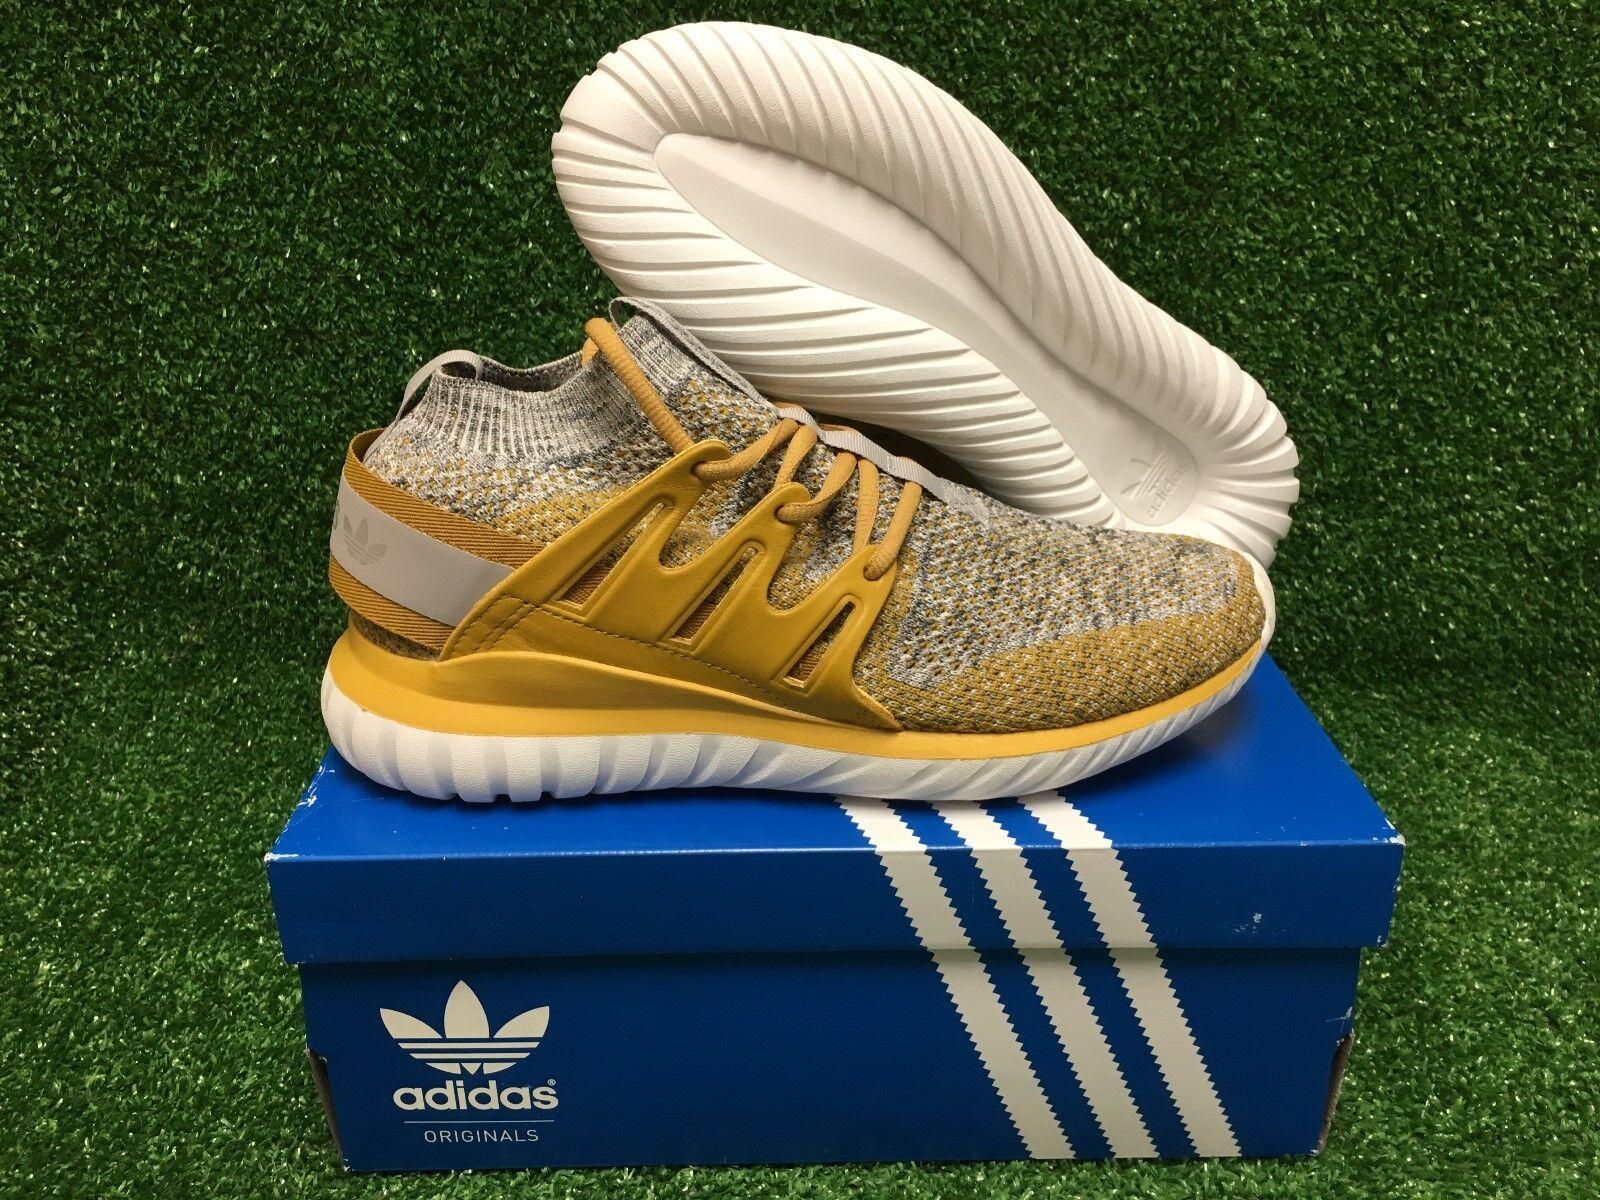 276b1b04905 NEW ADIDAS TUBULAR NOVA PRIMEKNIT MEN S NOMADE YELLOW GRANITE BB8407 PK  SHOES nsolkg6421-Athletic Shoes